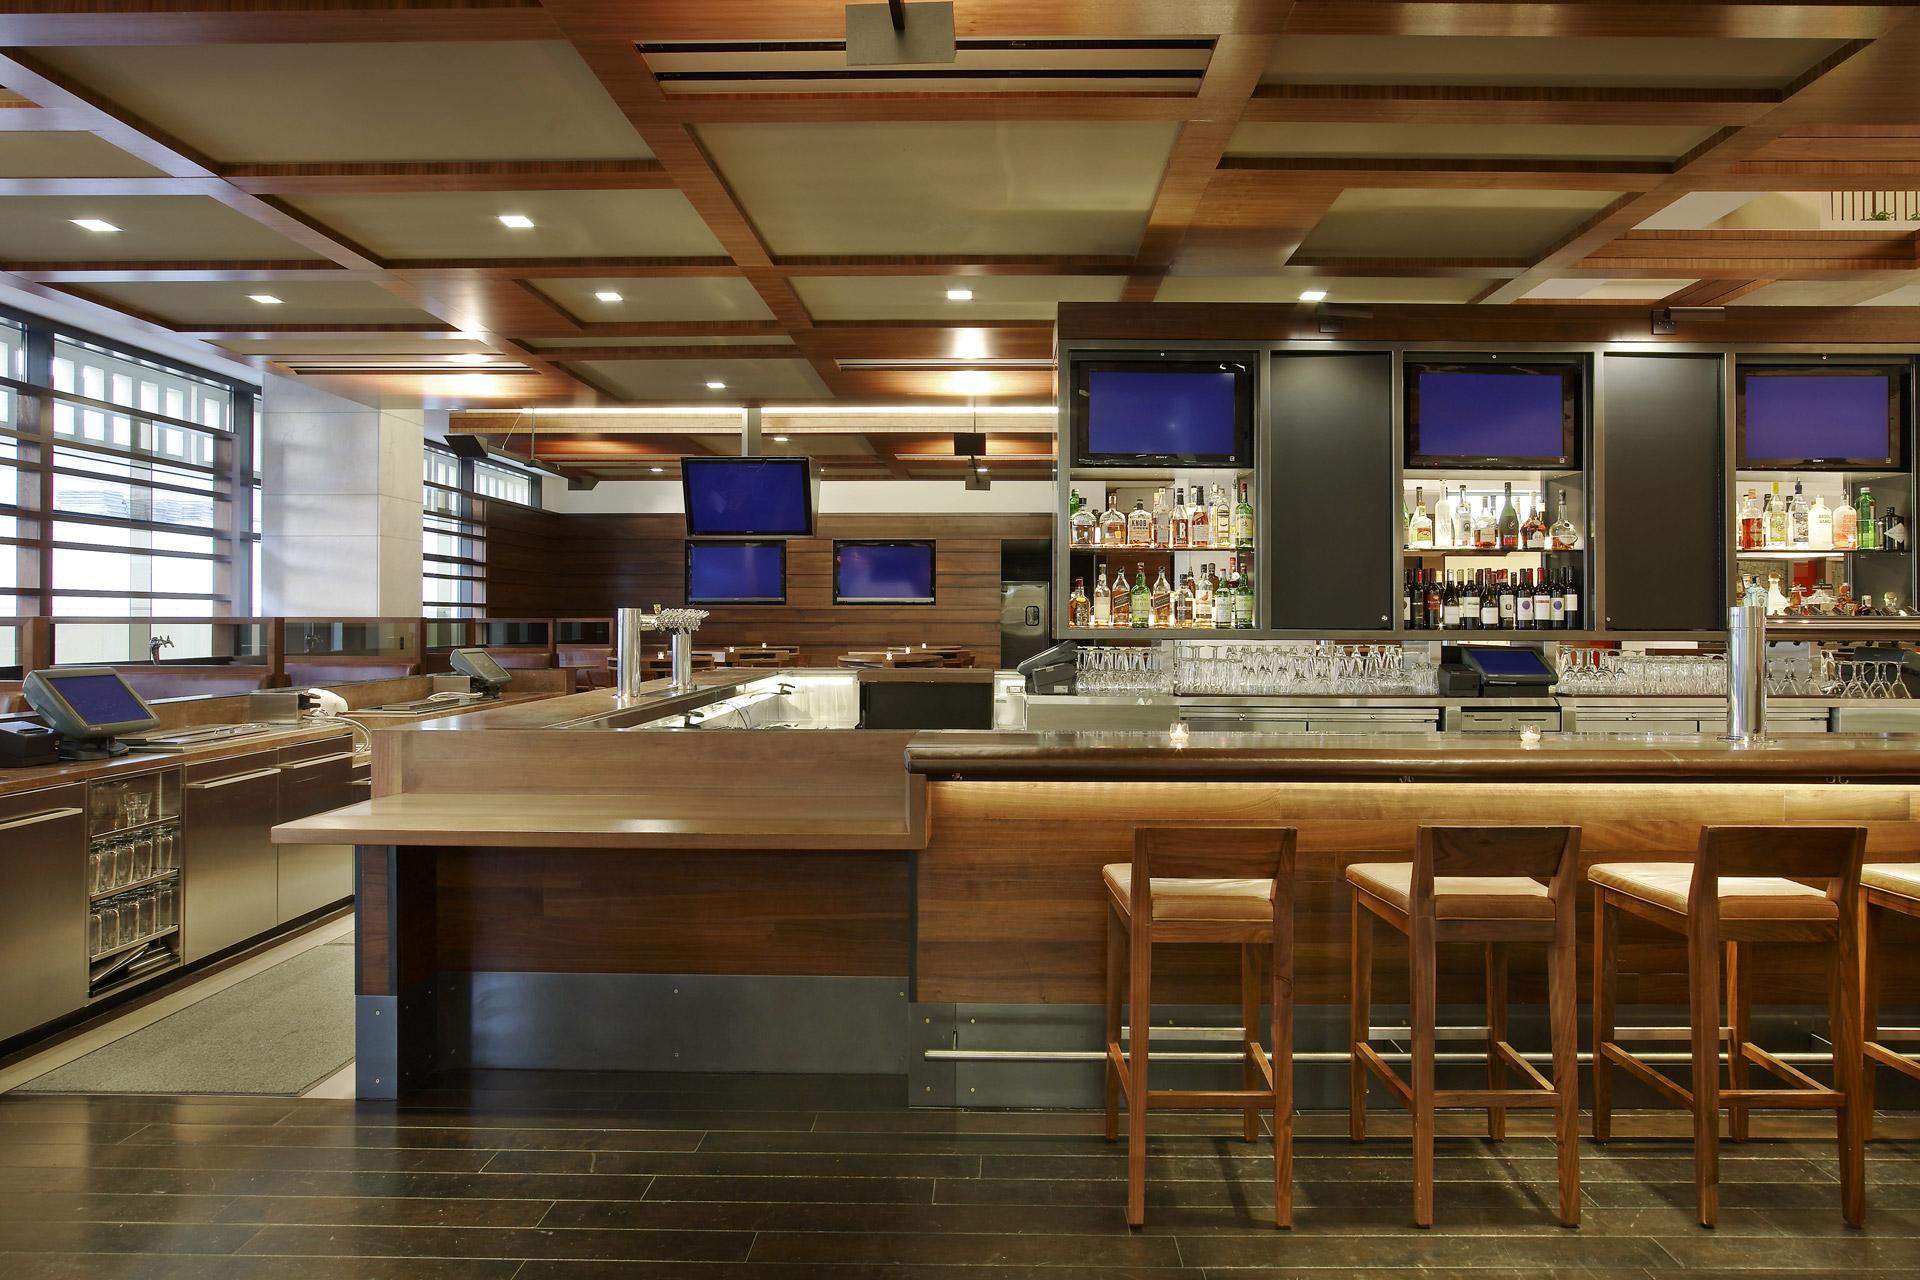 Twenty Two Storys & Market restaurant decor